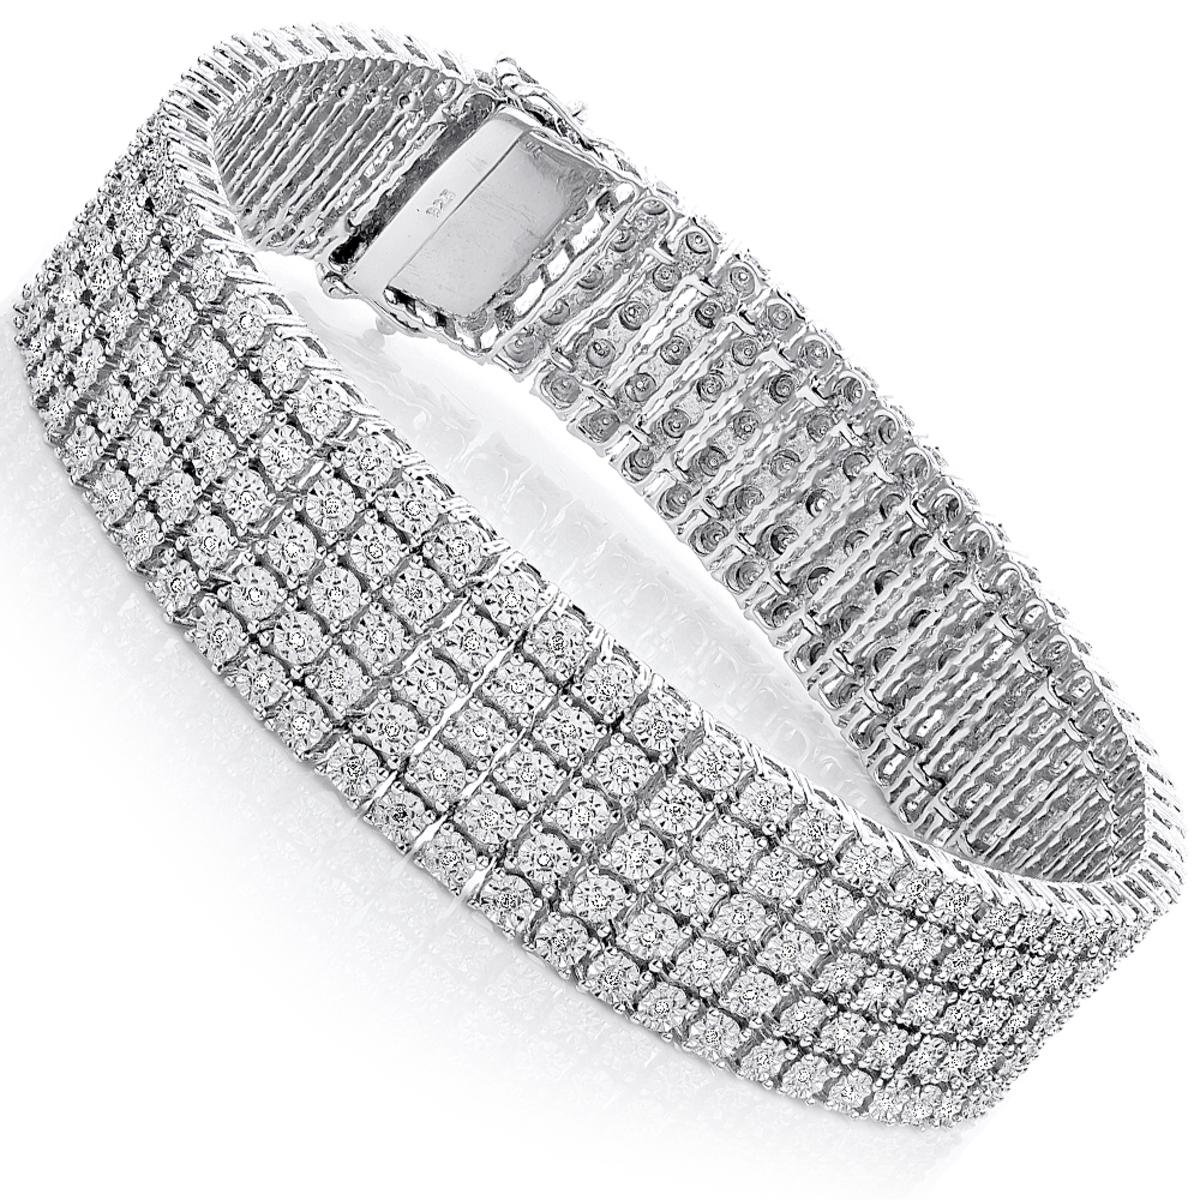 Mens Sterling Silver Bracelets: 5 Row Diamond Bracelet 0.81ct